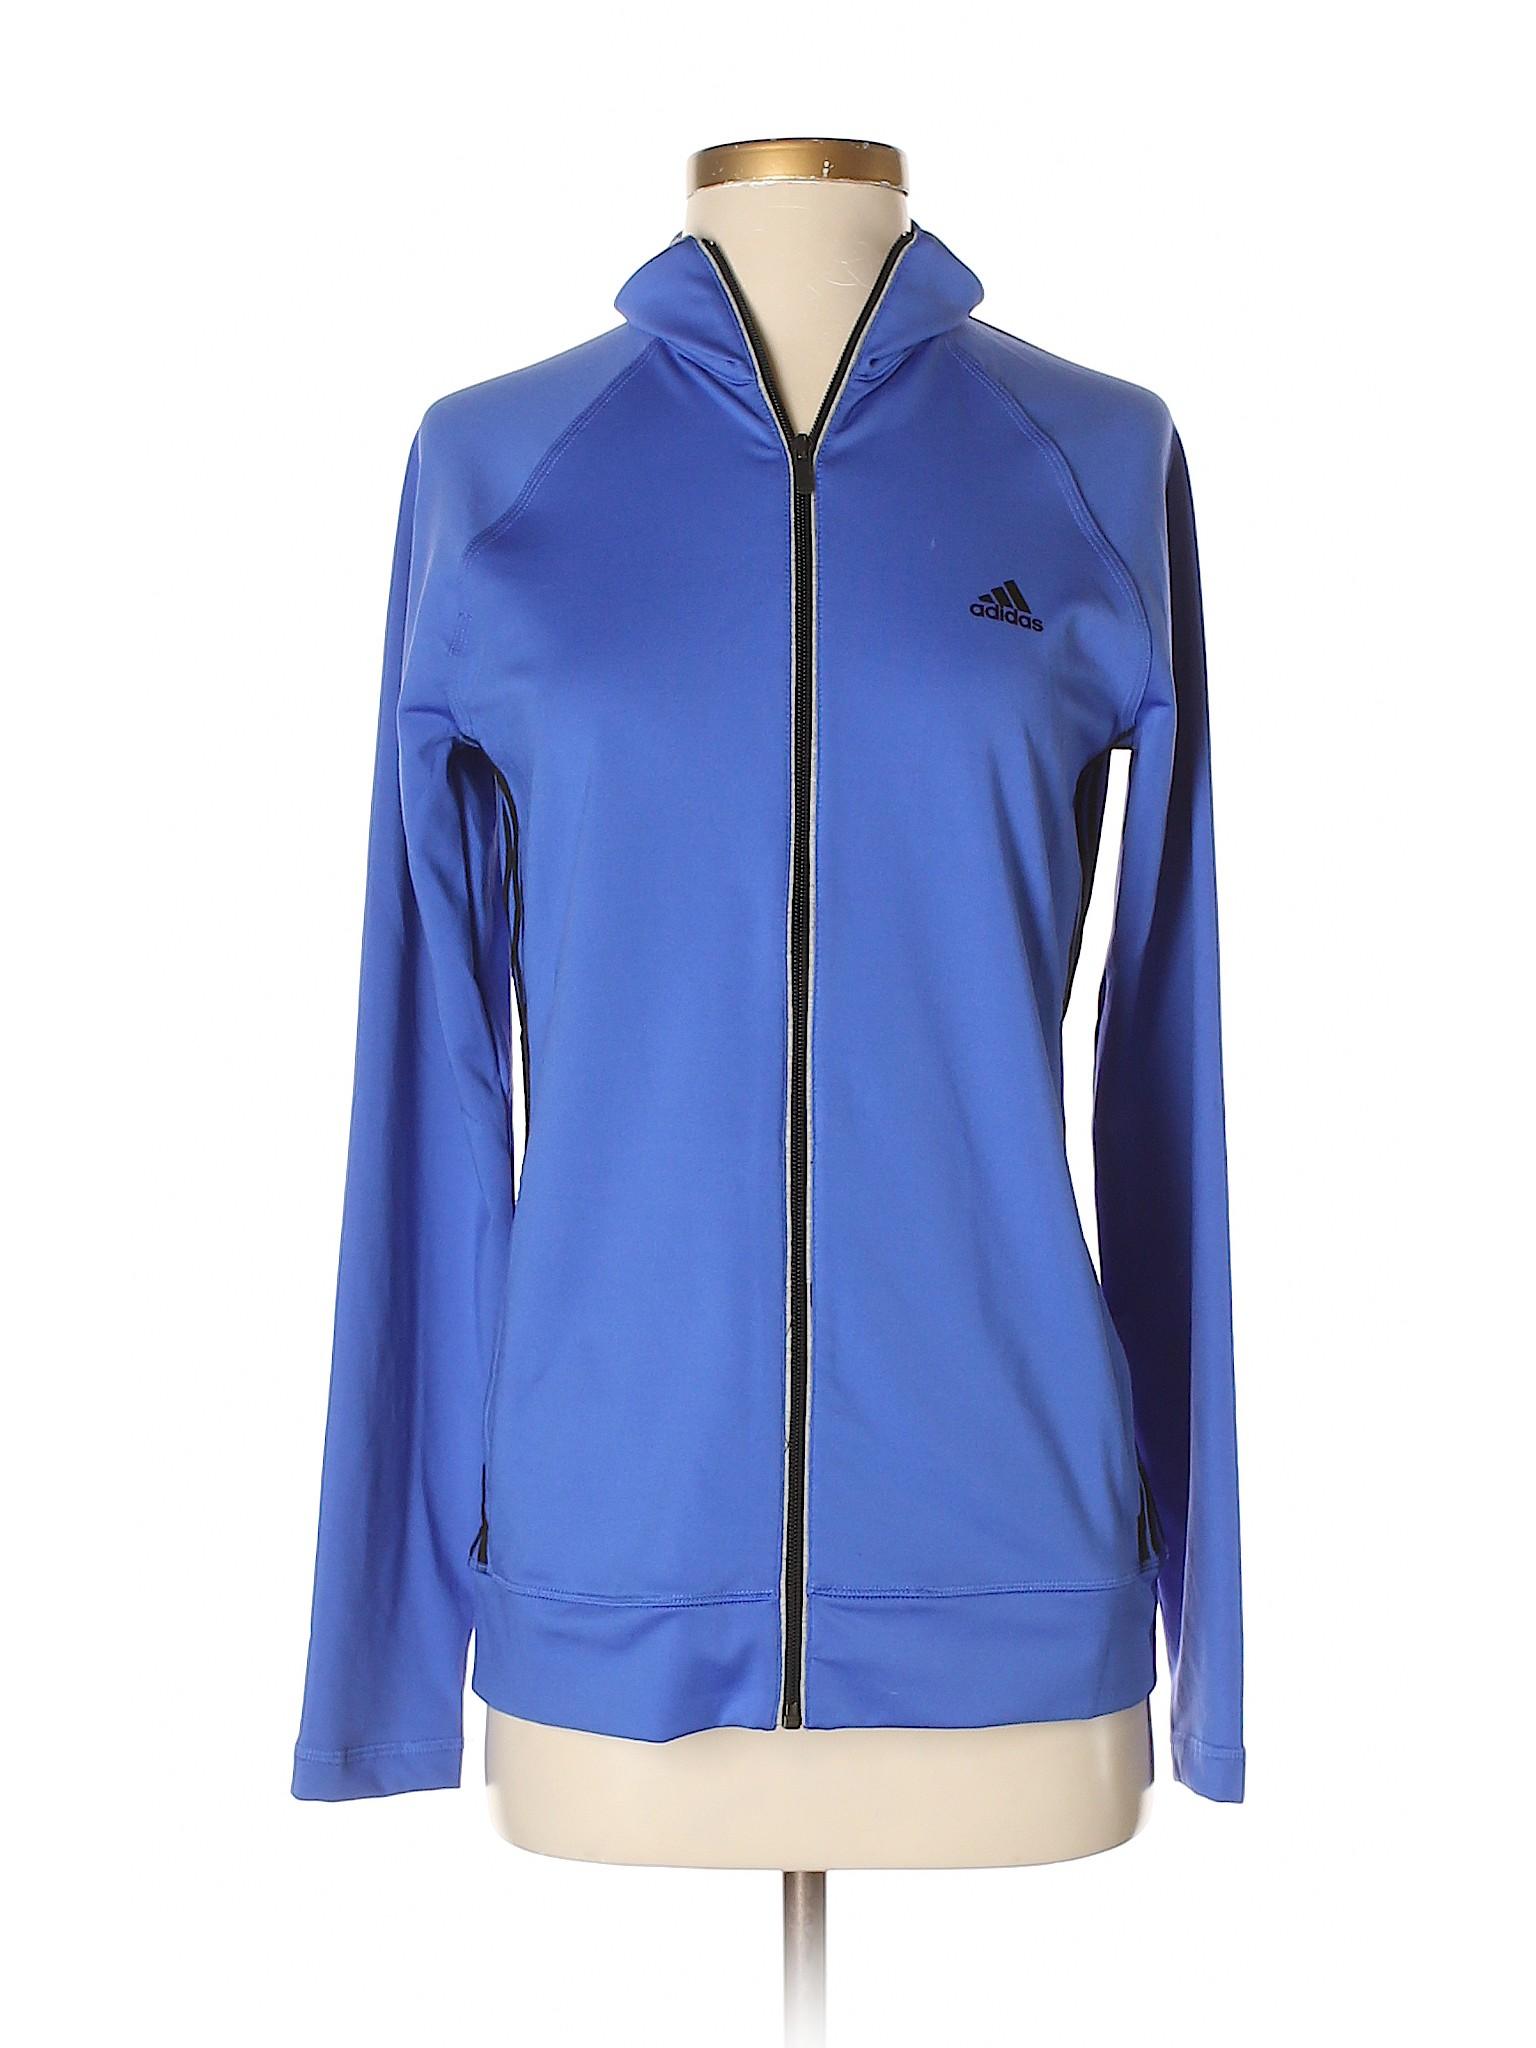 Boutique Boutique Adidas Jacket Track Adidas qv4YX8x